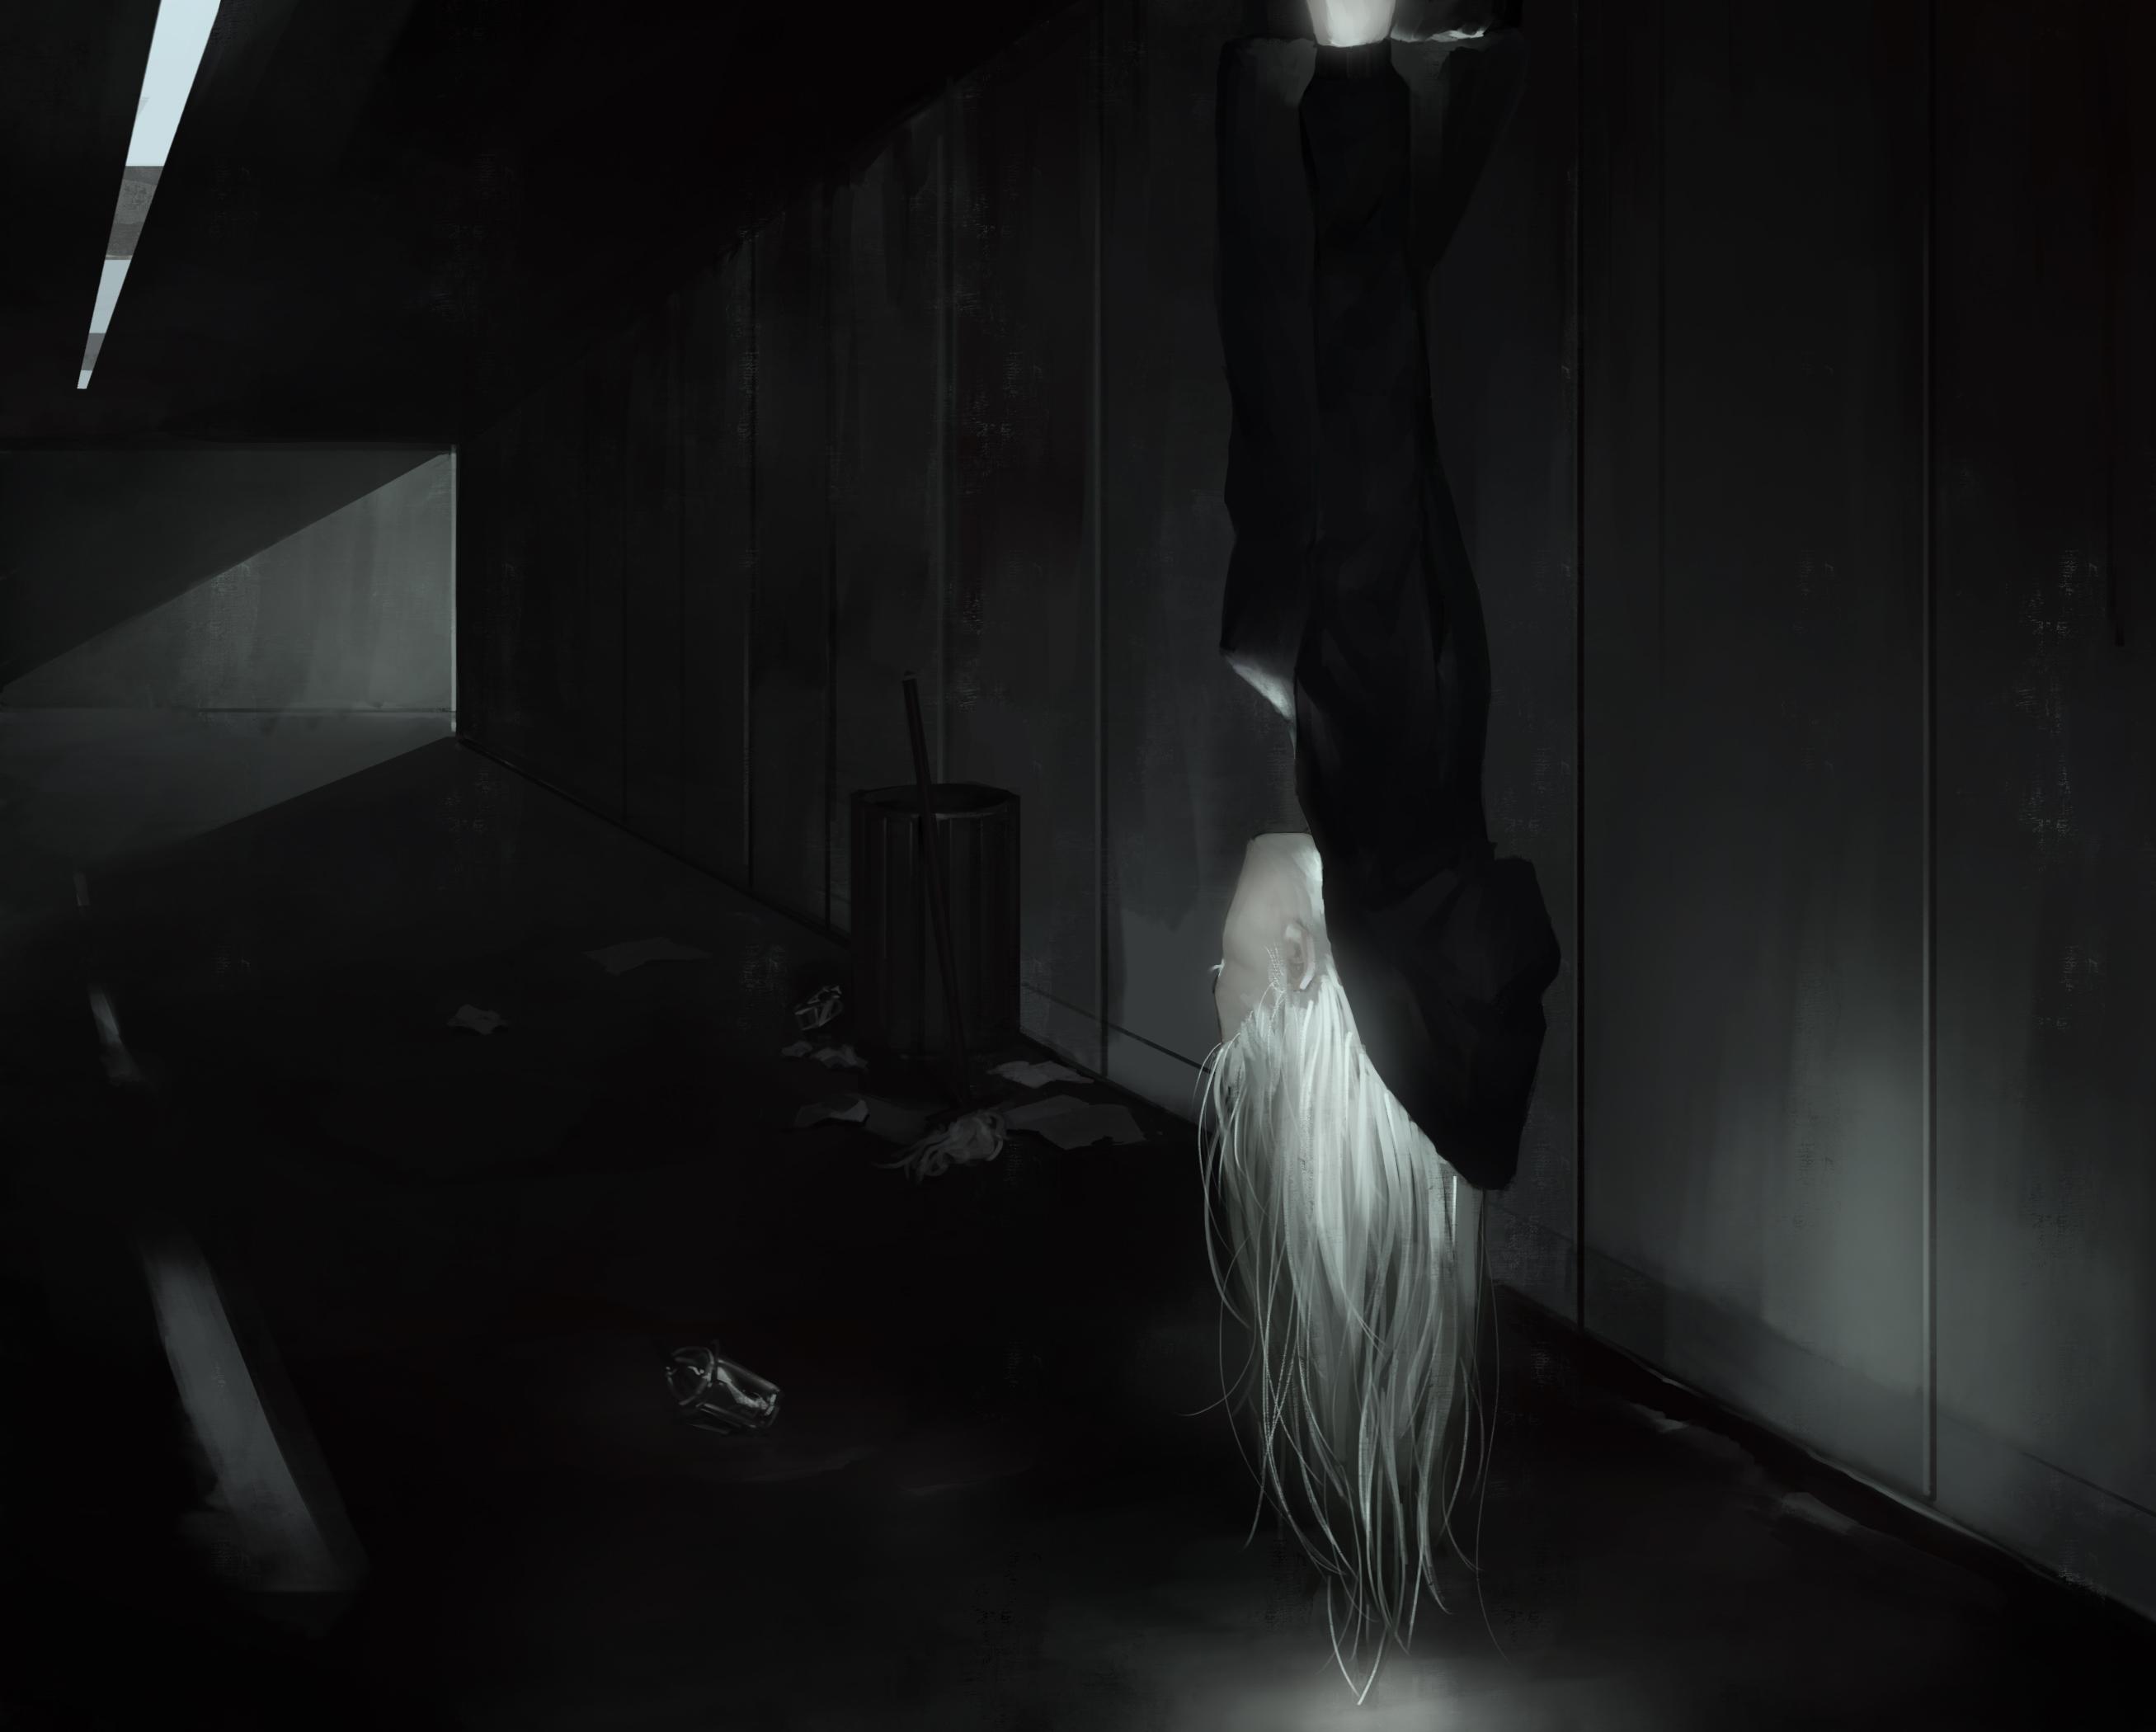 Digital Art Illustration Midfinger White Hair Original Characters Dark 2614x2100